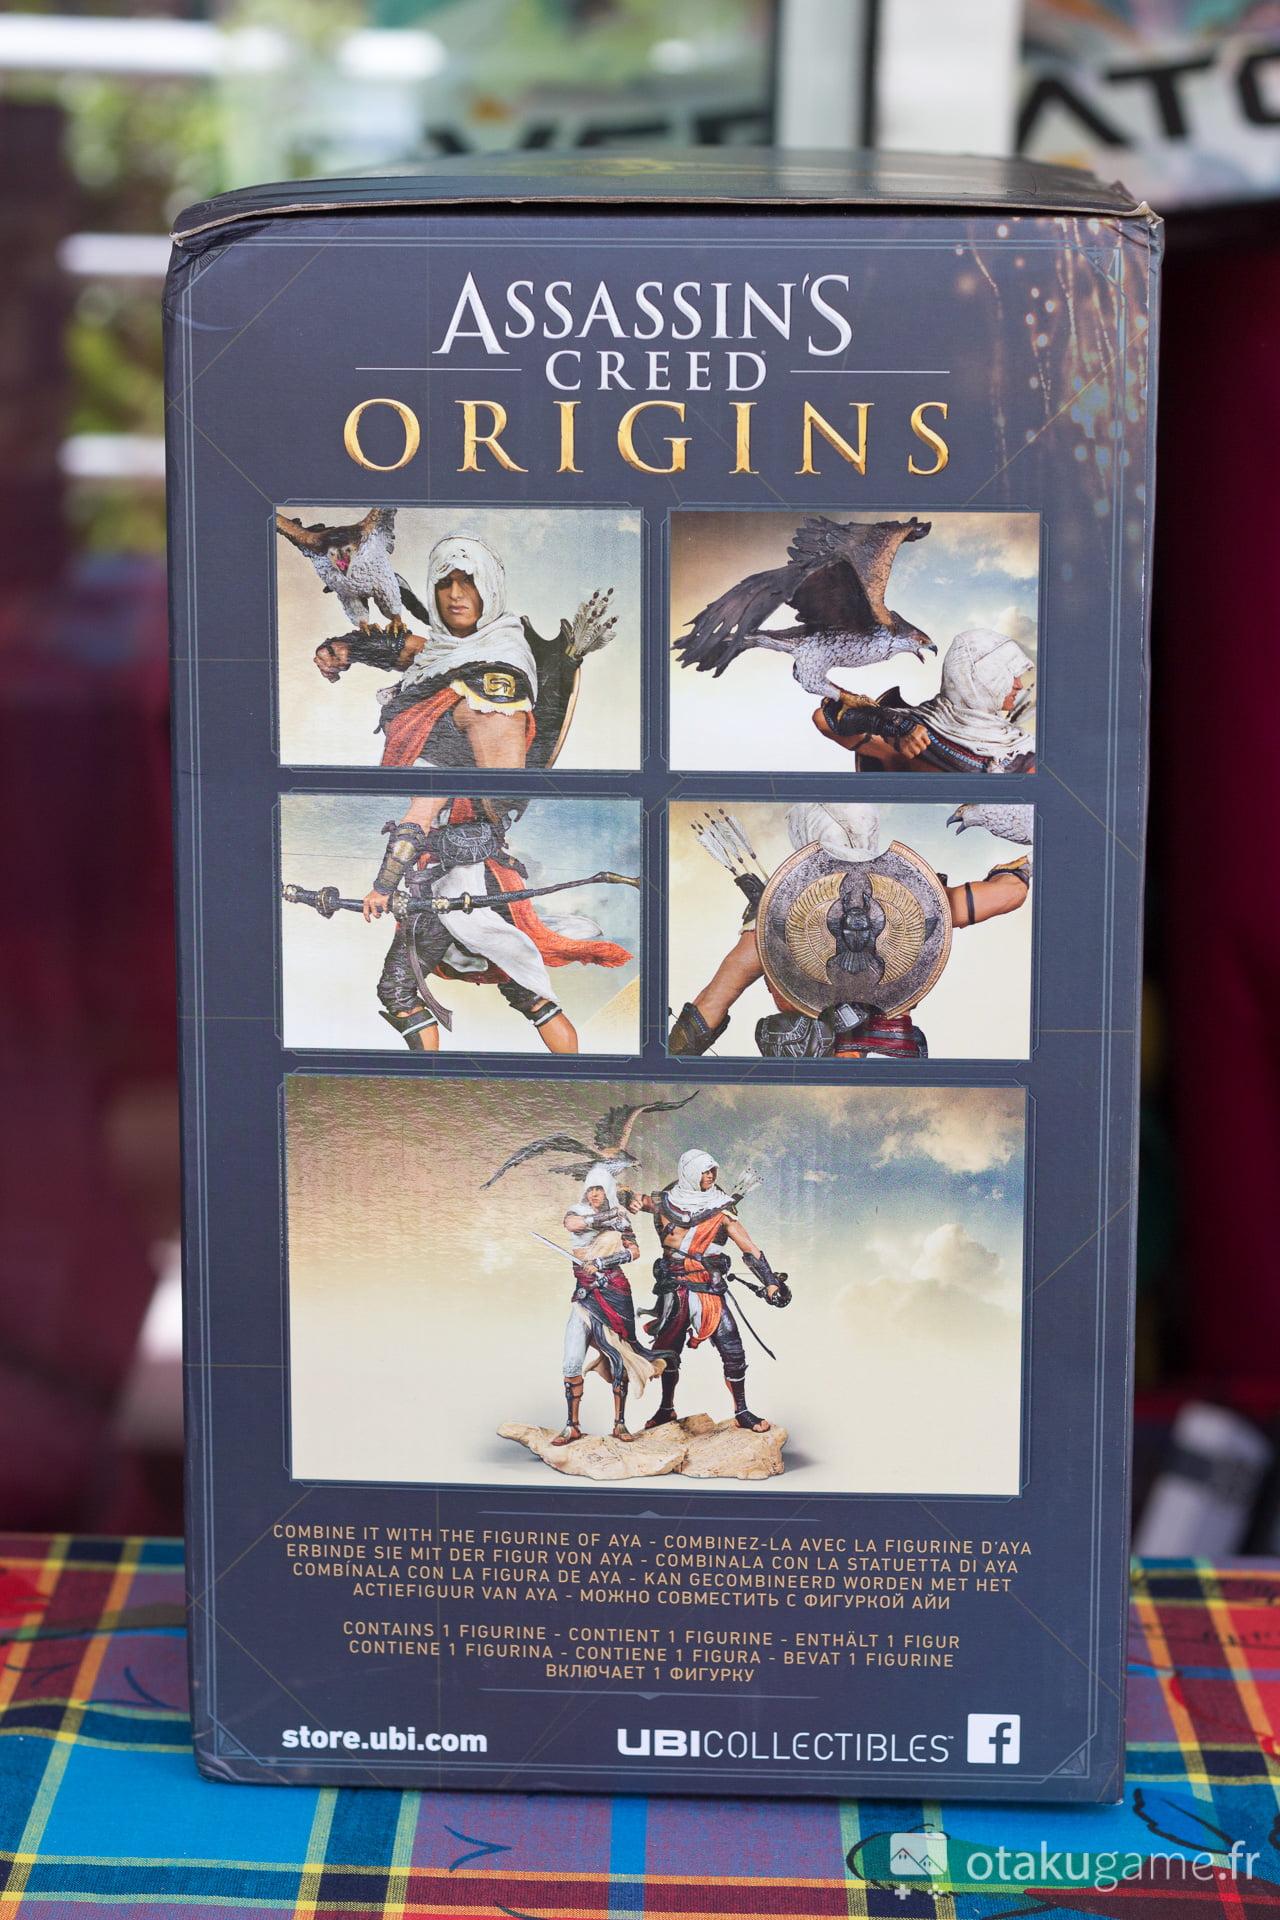 Boîte de la figurine de Bayek d'Asssassin's Creed Origins